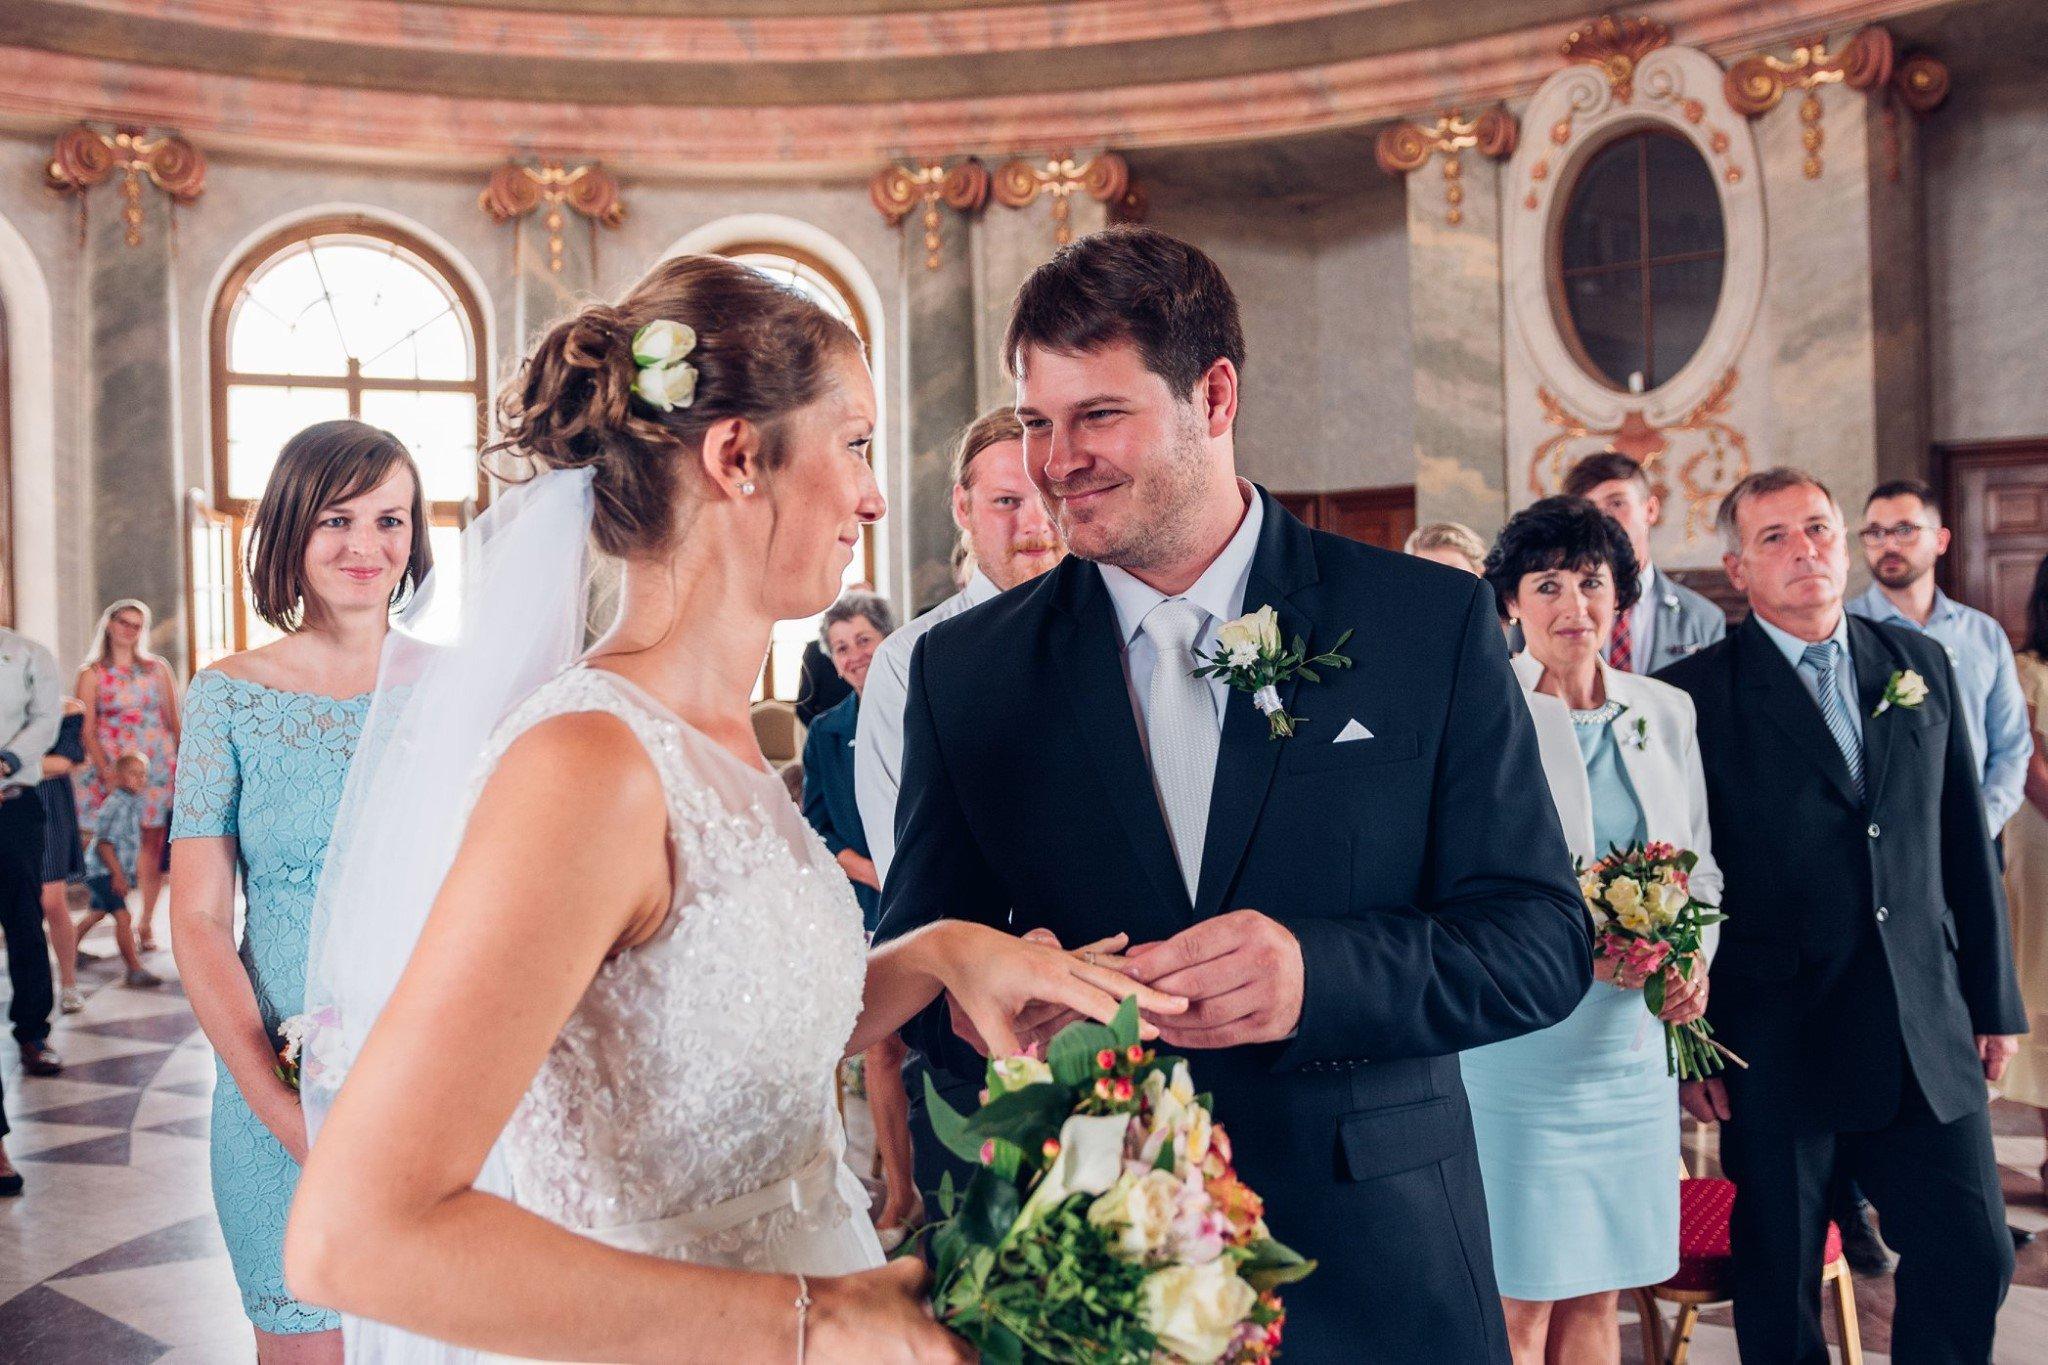 svatba chlumec nad cidlinou, svatba karlova koruna, zamek karlova korun